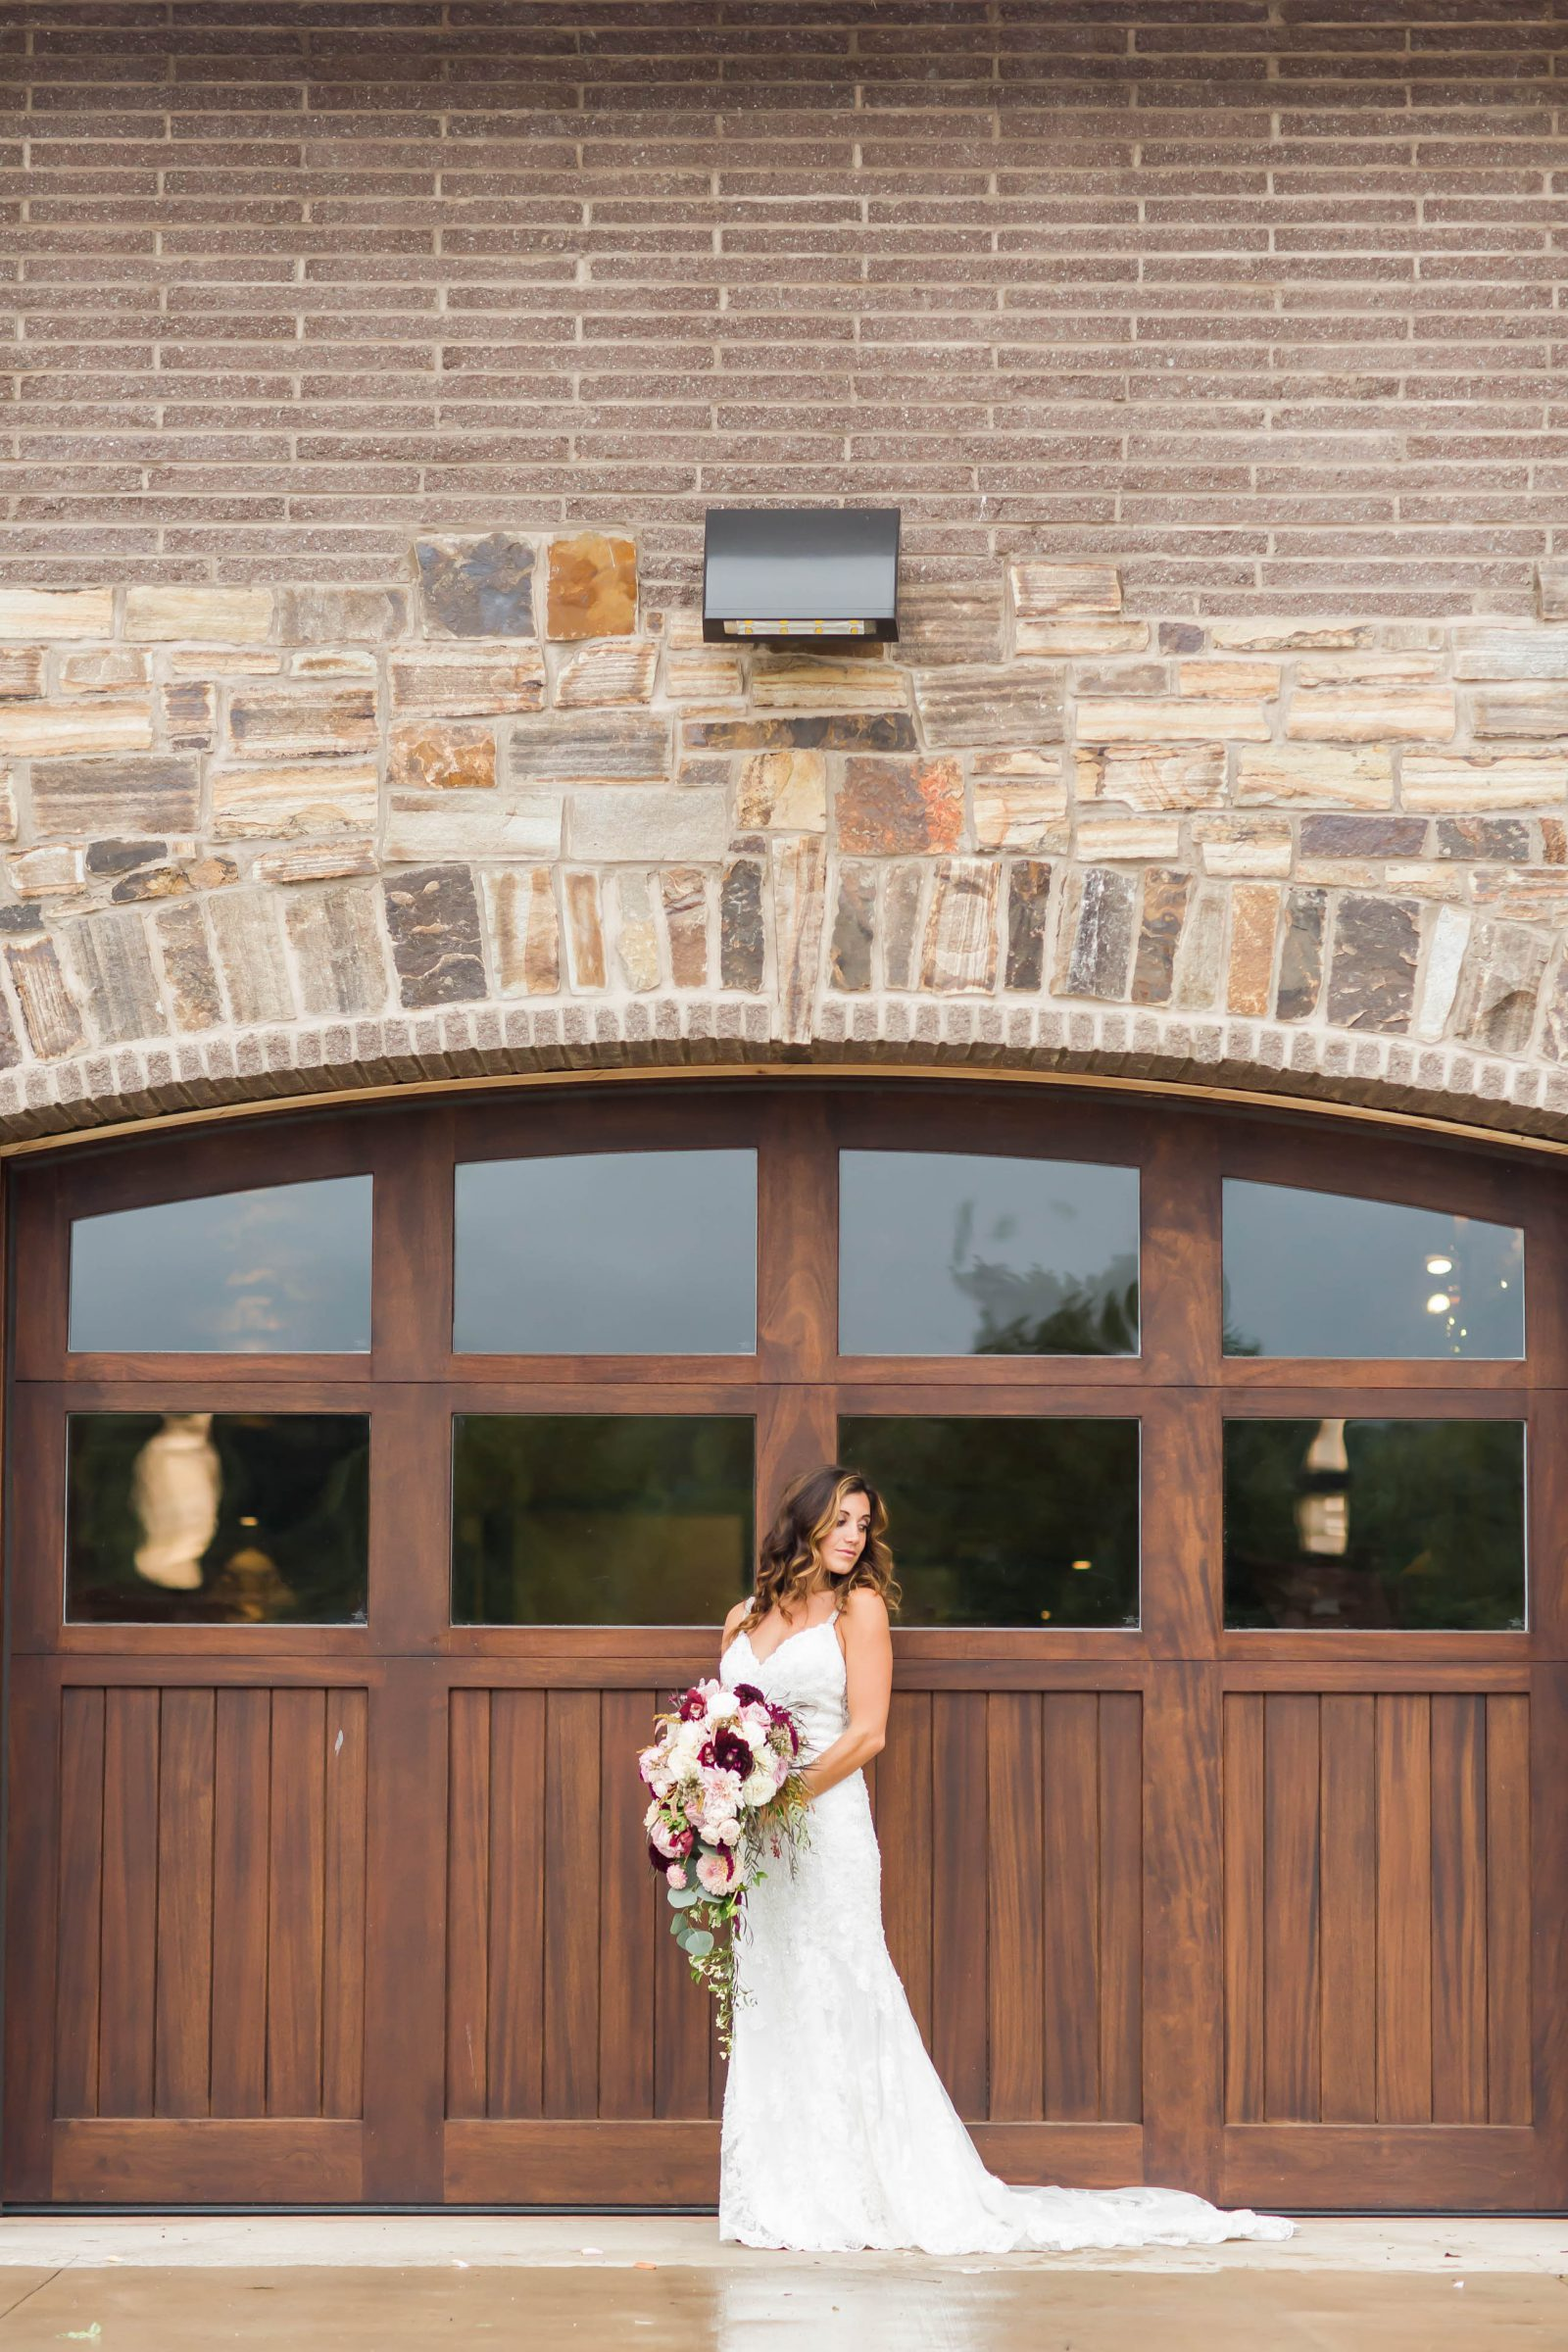 sunny-hill-wedding-venue-loren-jackson-photography-49